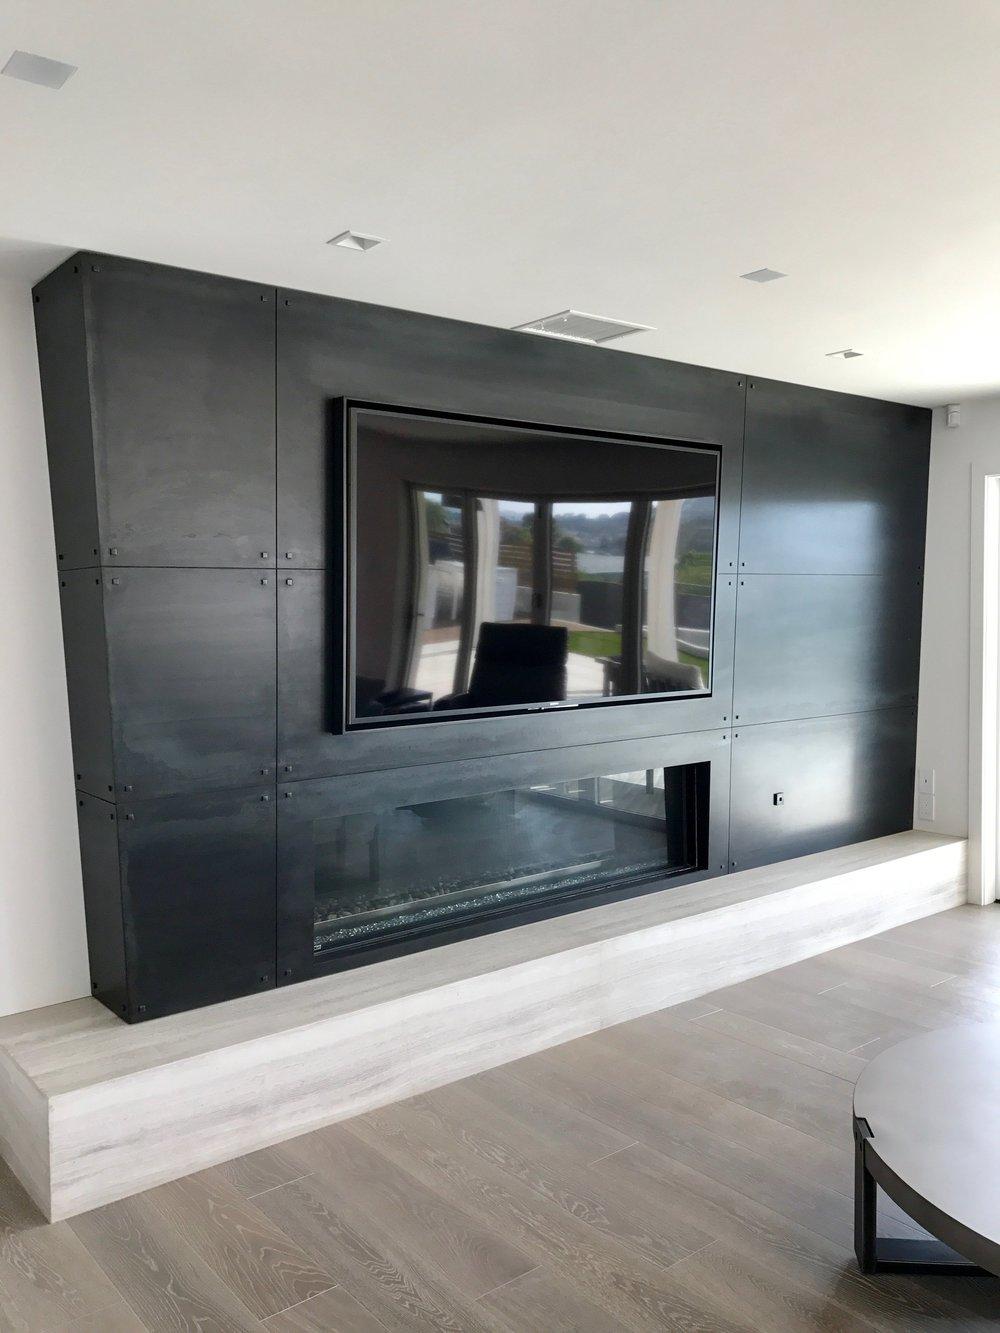 EL SUENO   Fireplace Wall & Bi-Folding Door System